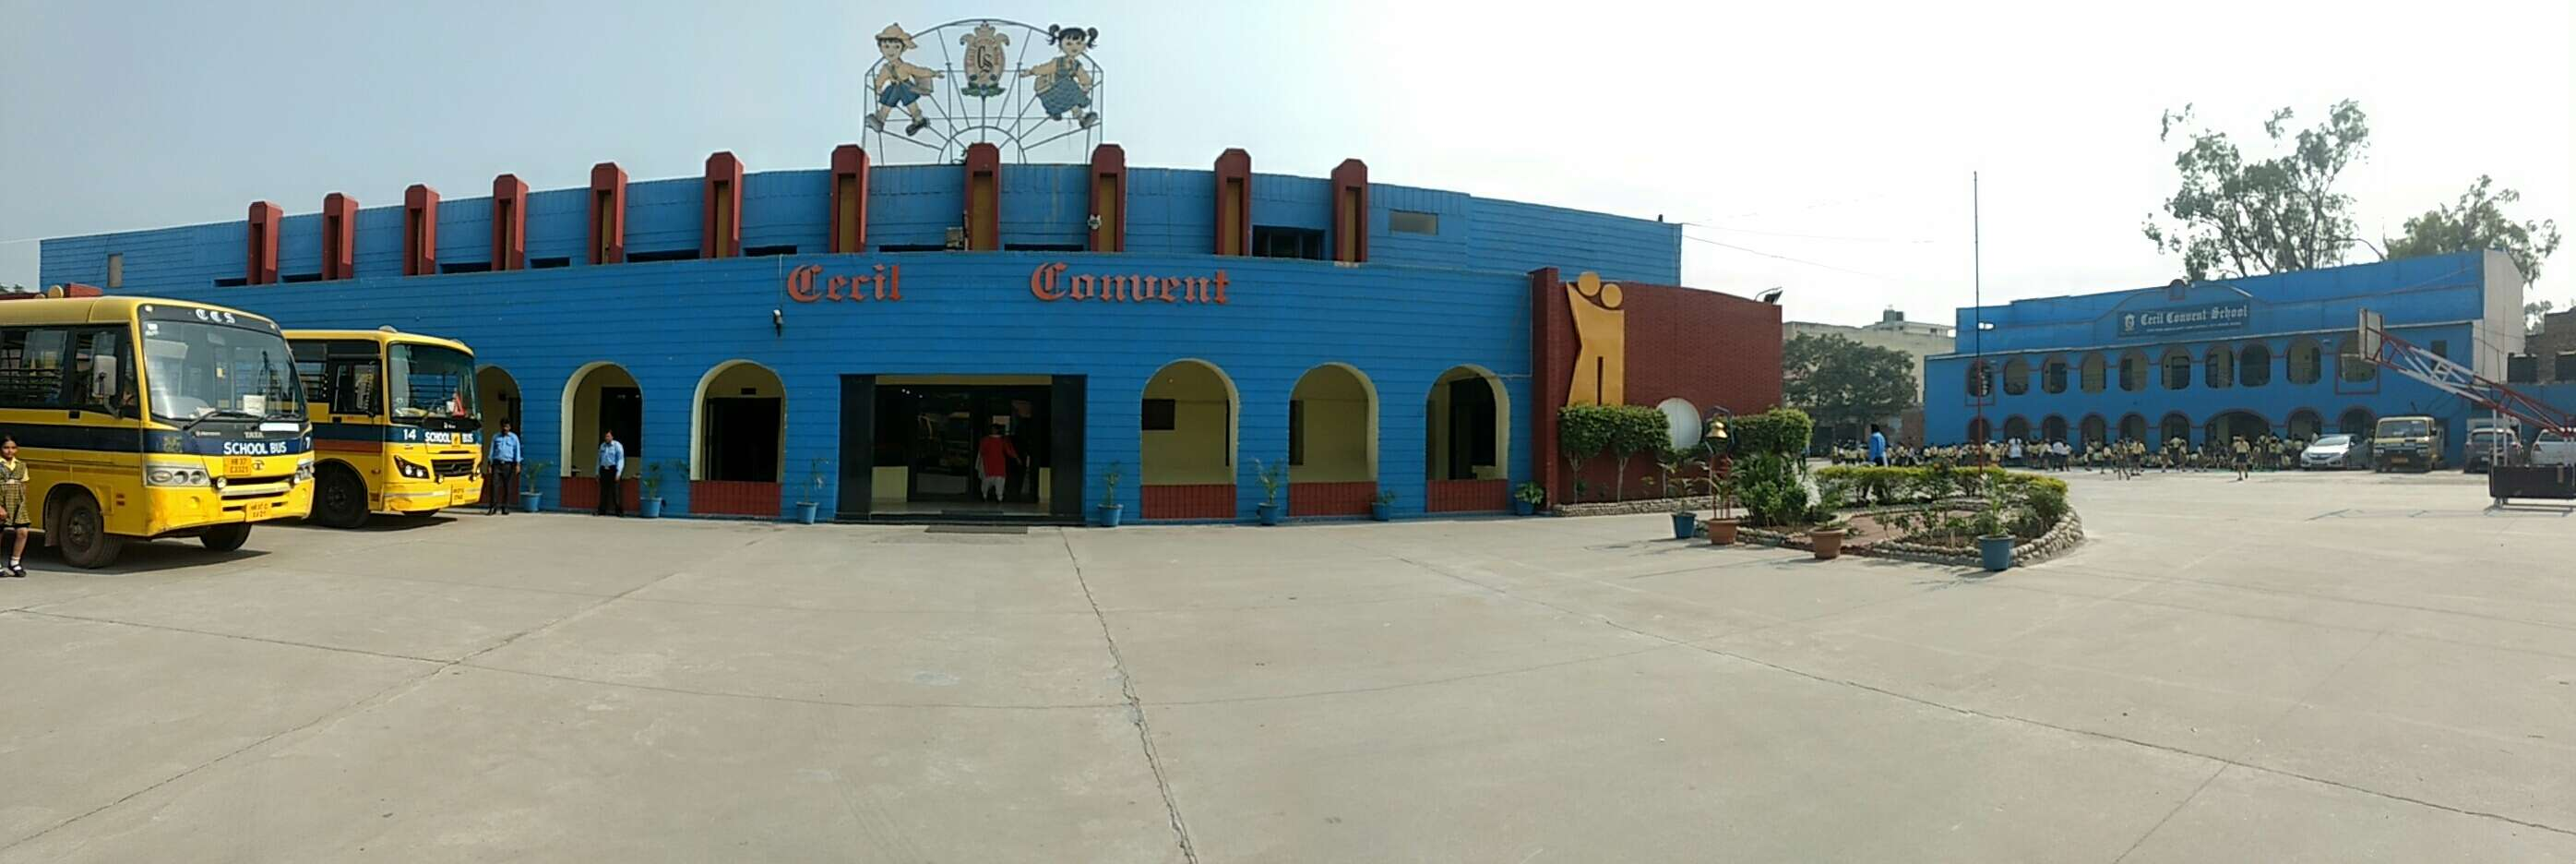 Cecil Convent School 27 Staff Road Ambala Cantt 530850